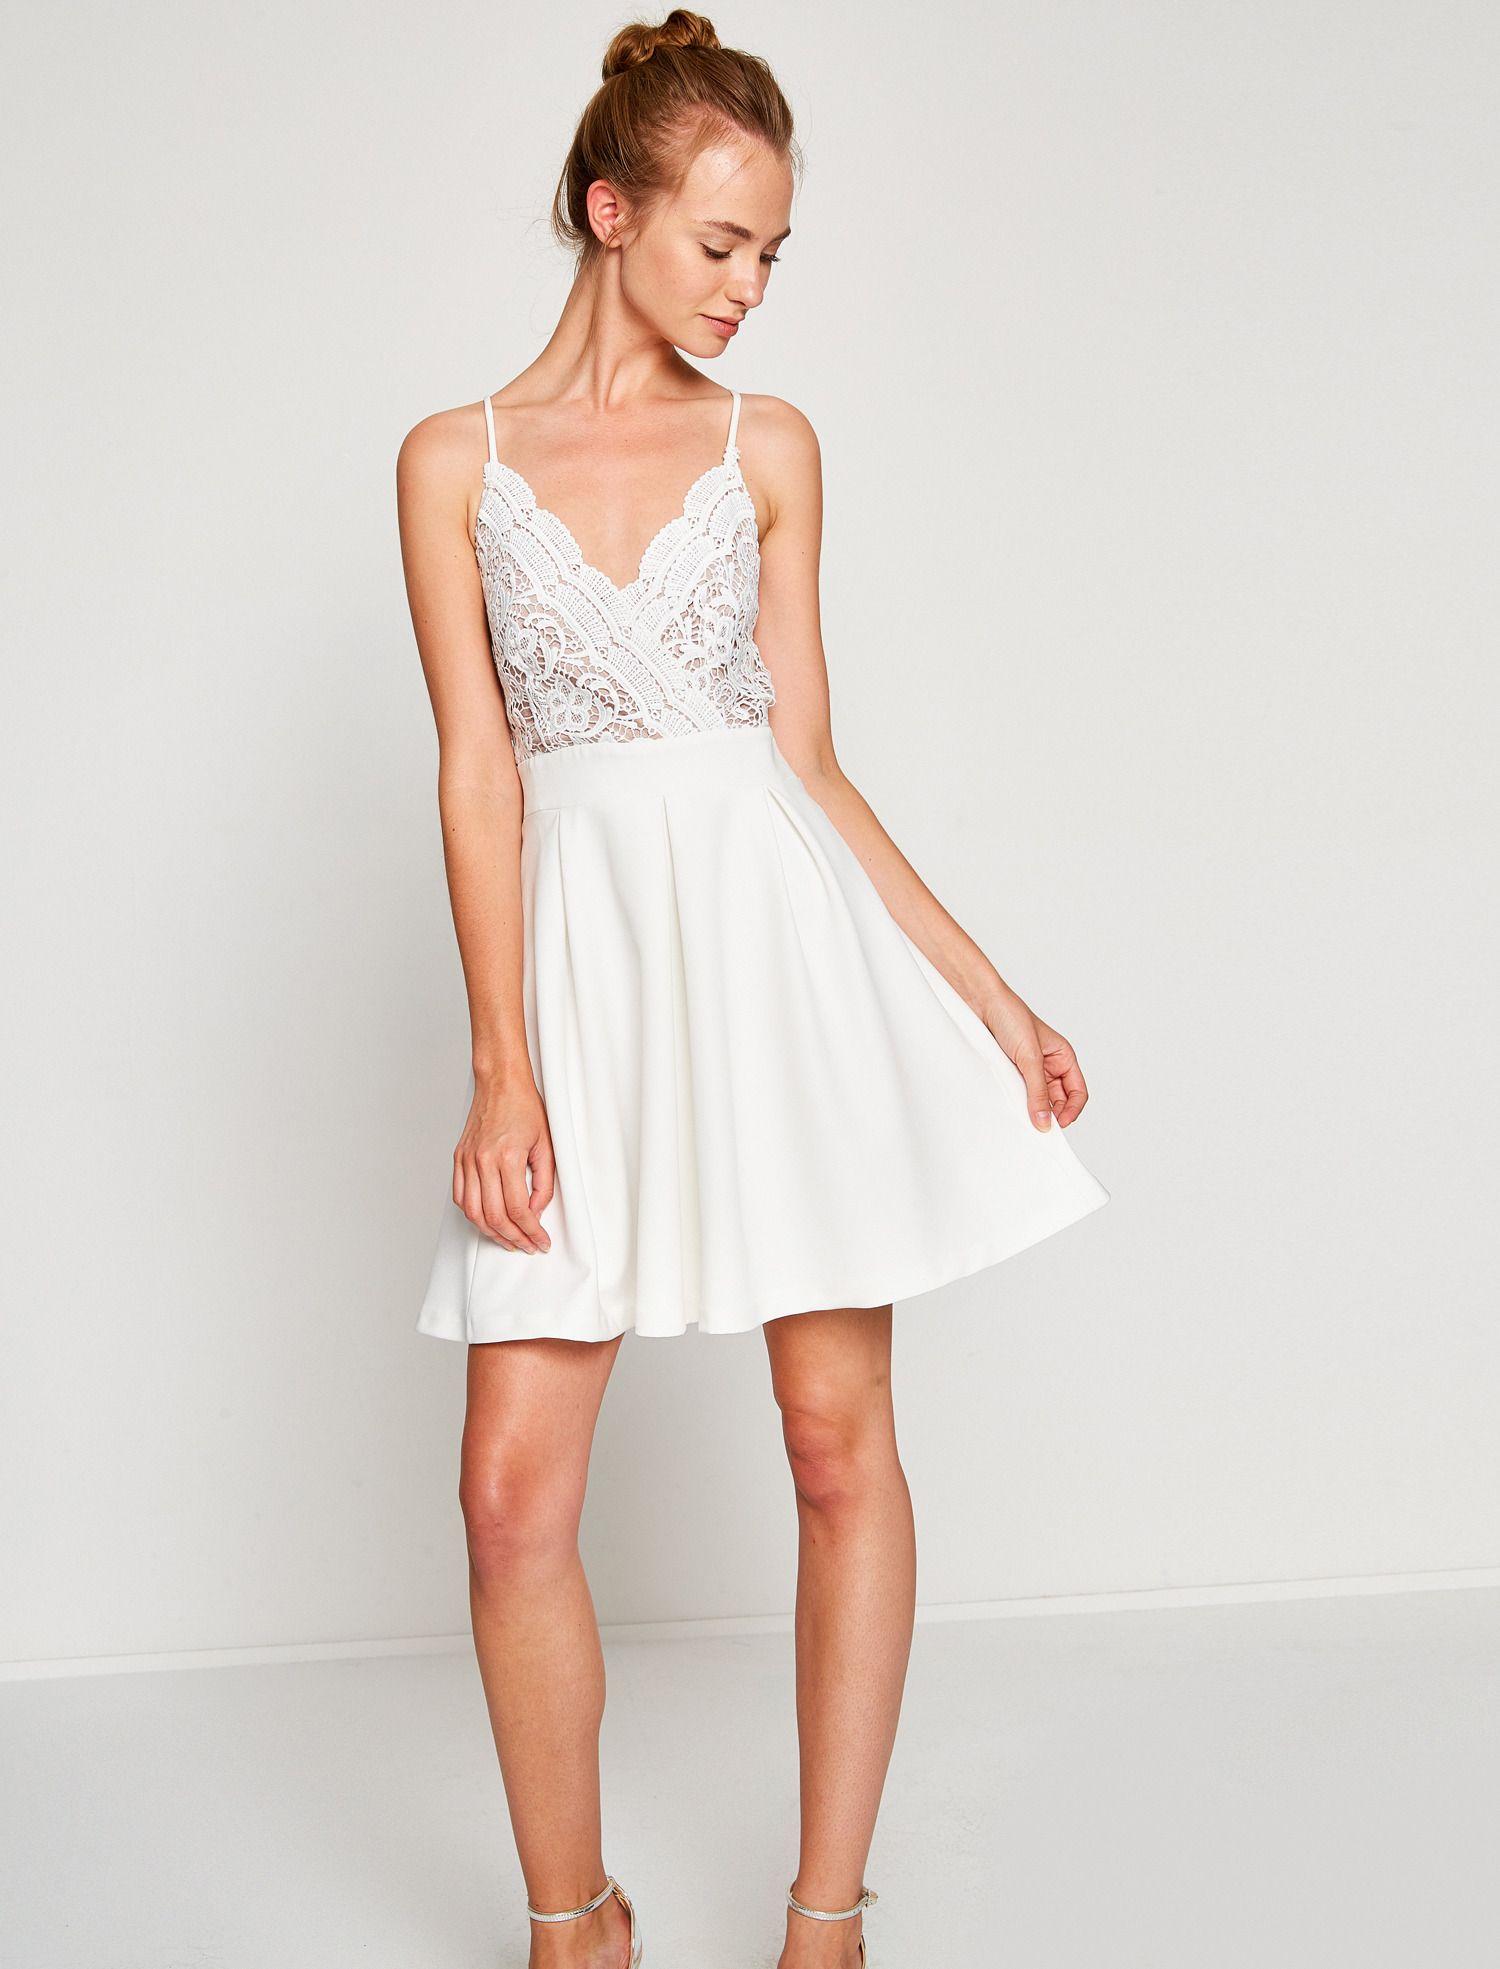 Koton Koton Kadin Dantel Detayli Elbise Elbise The Dress Resmi Elbise